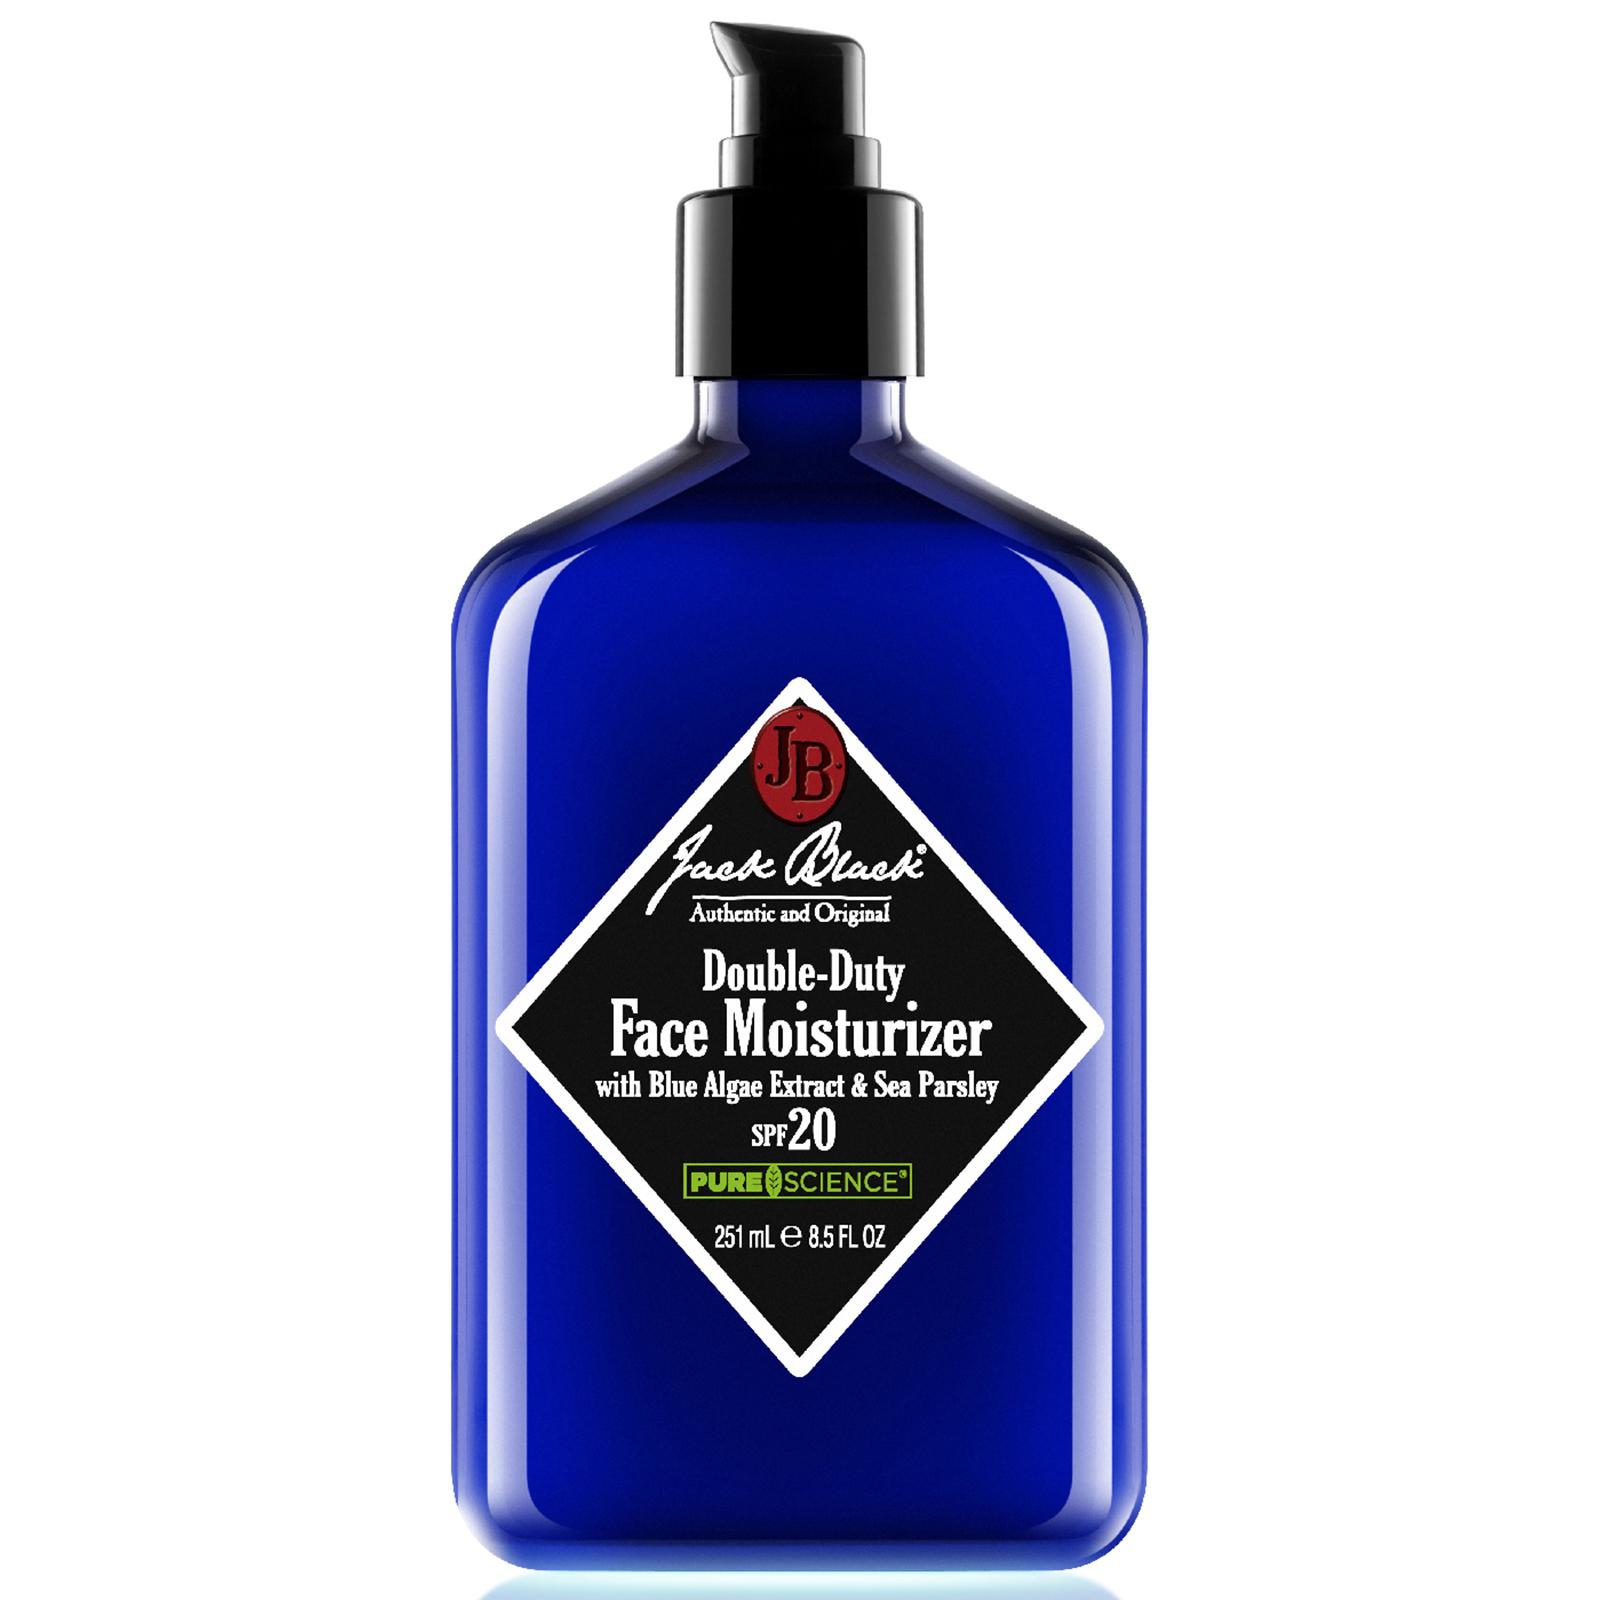 jack black double duty face moisturizer